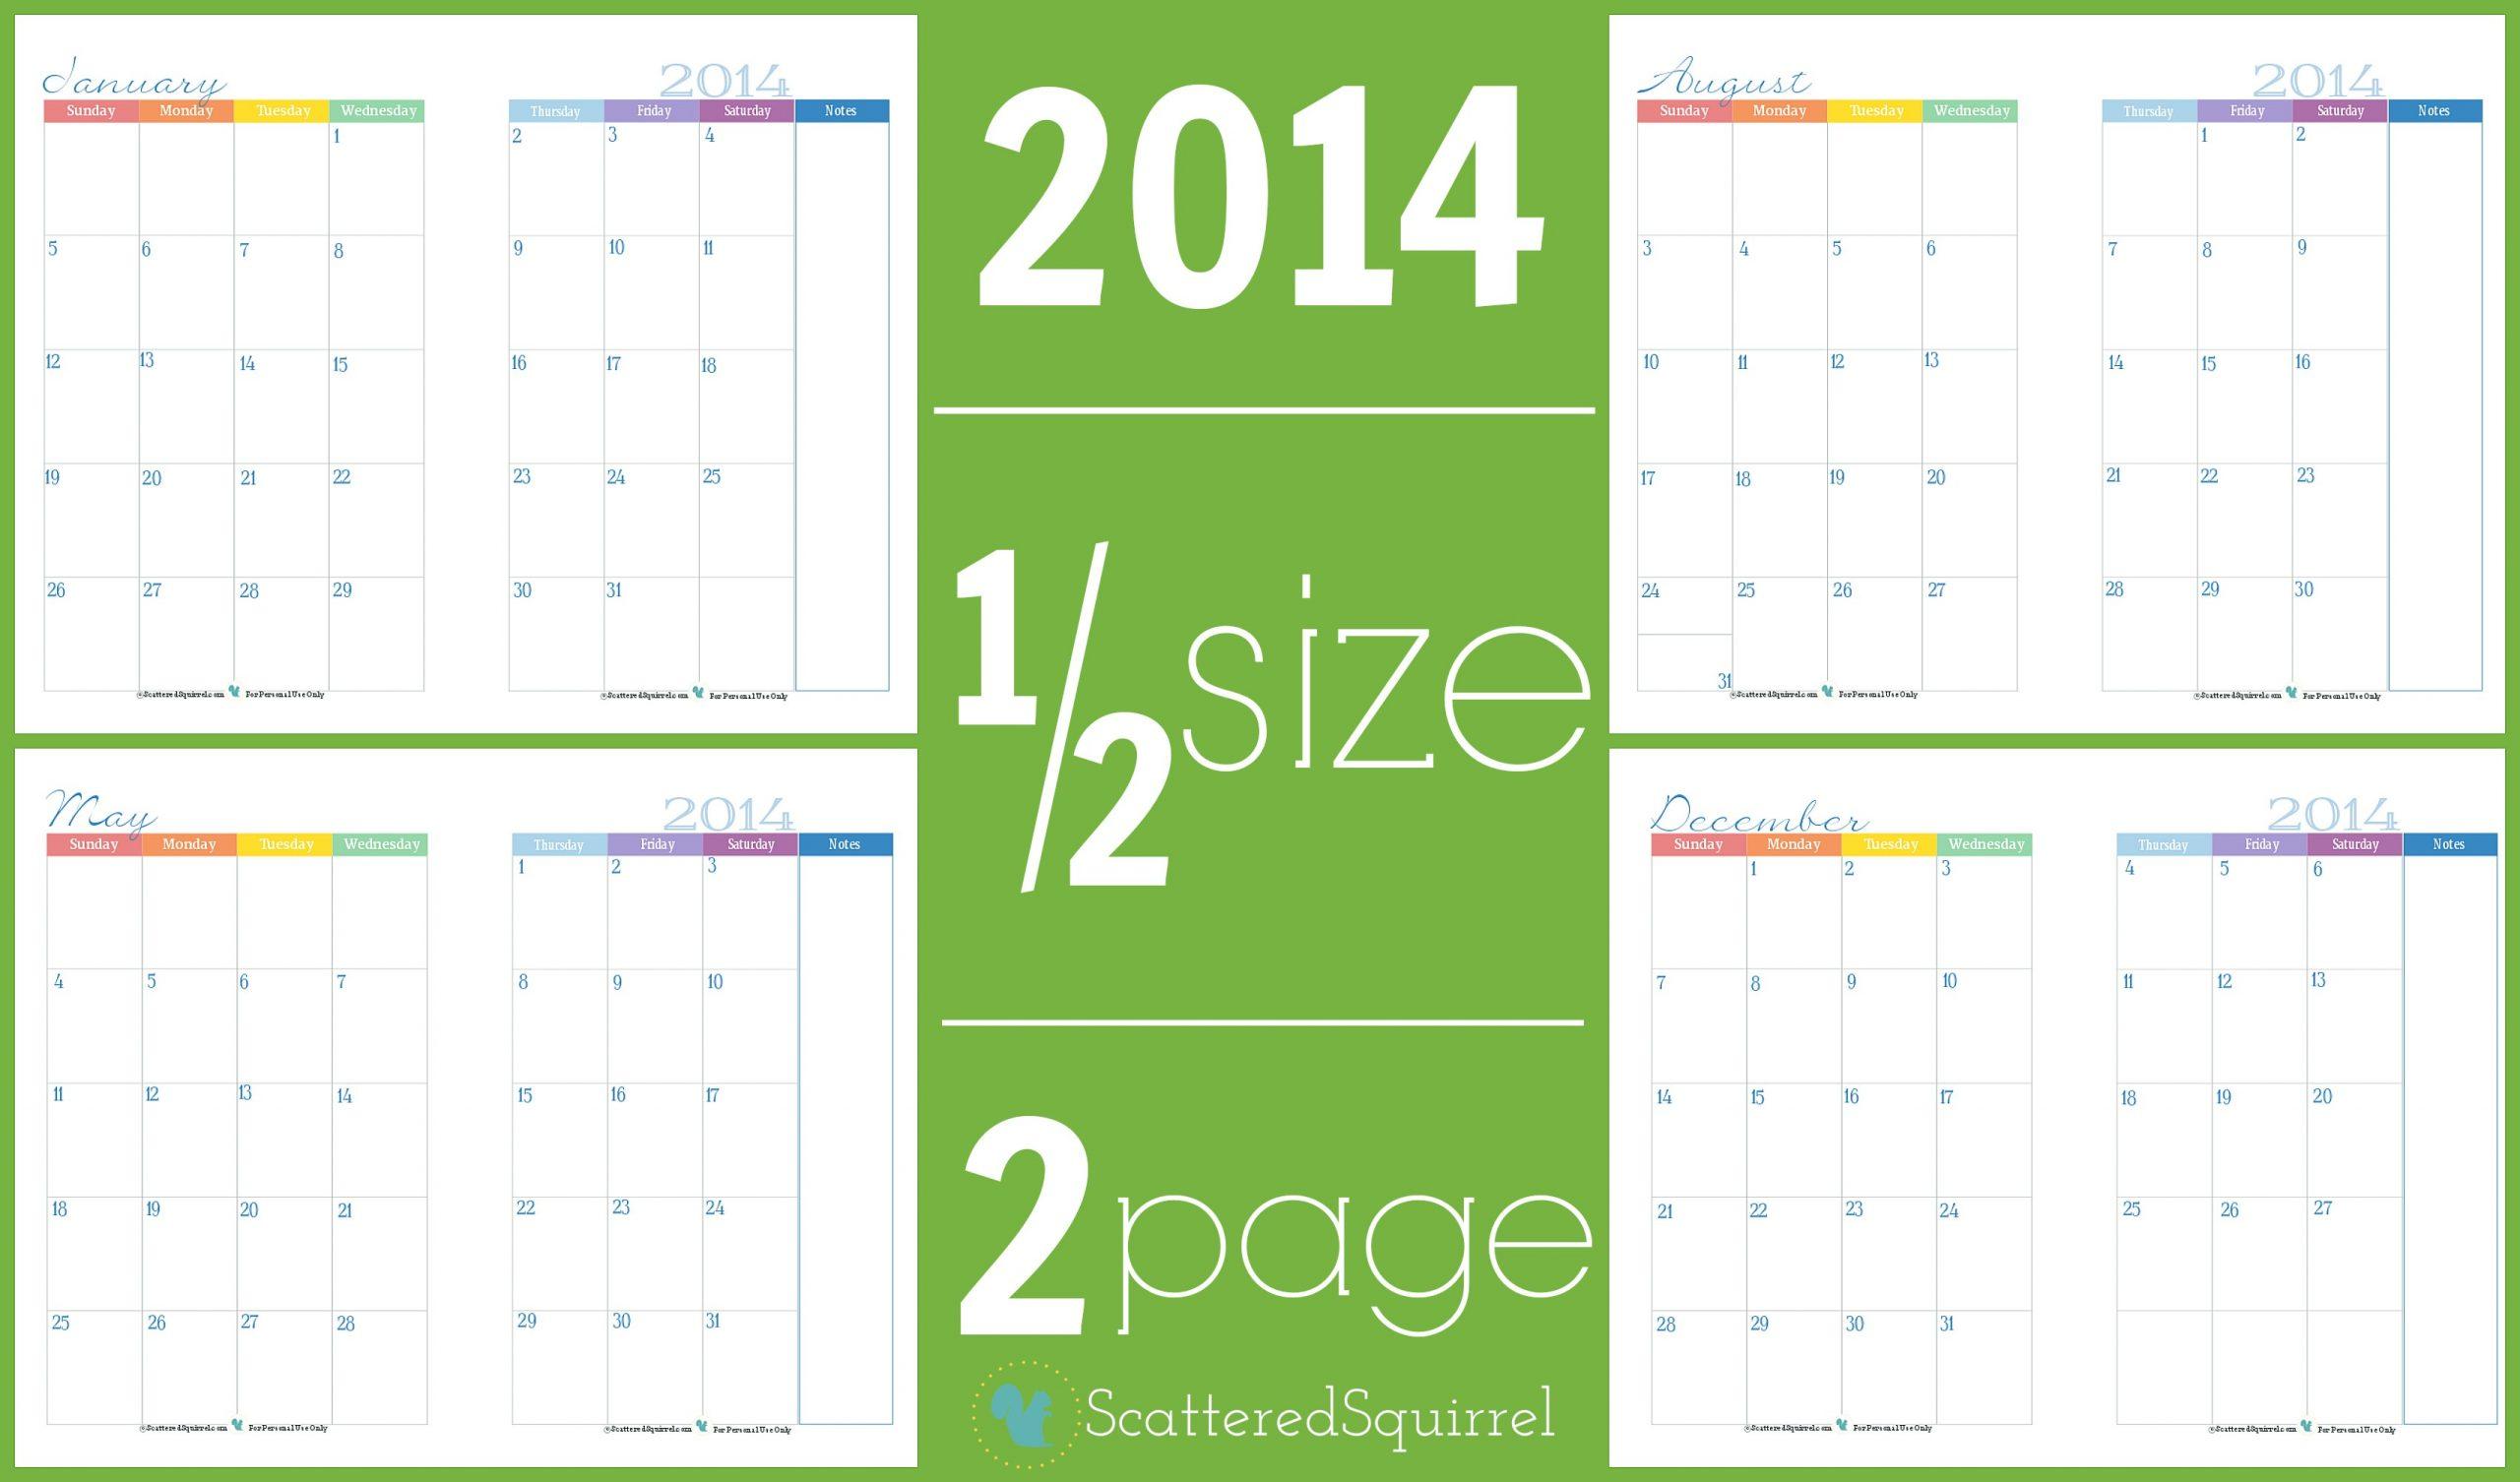 calendar template 4 months per page  2014 Calendars: Part 3 - Scattered Squirrel - calendar template 4 months per page